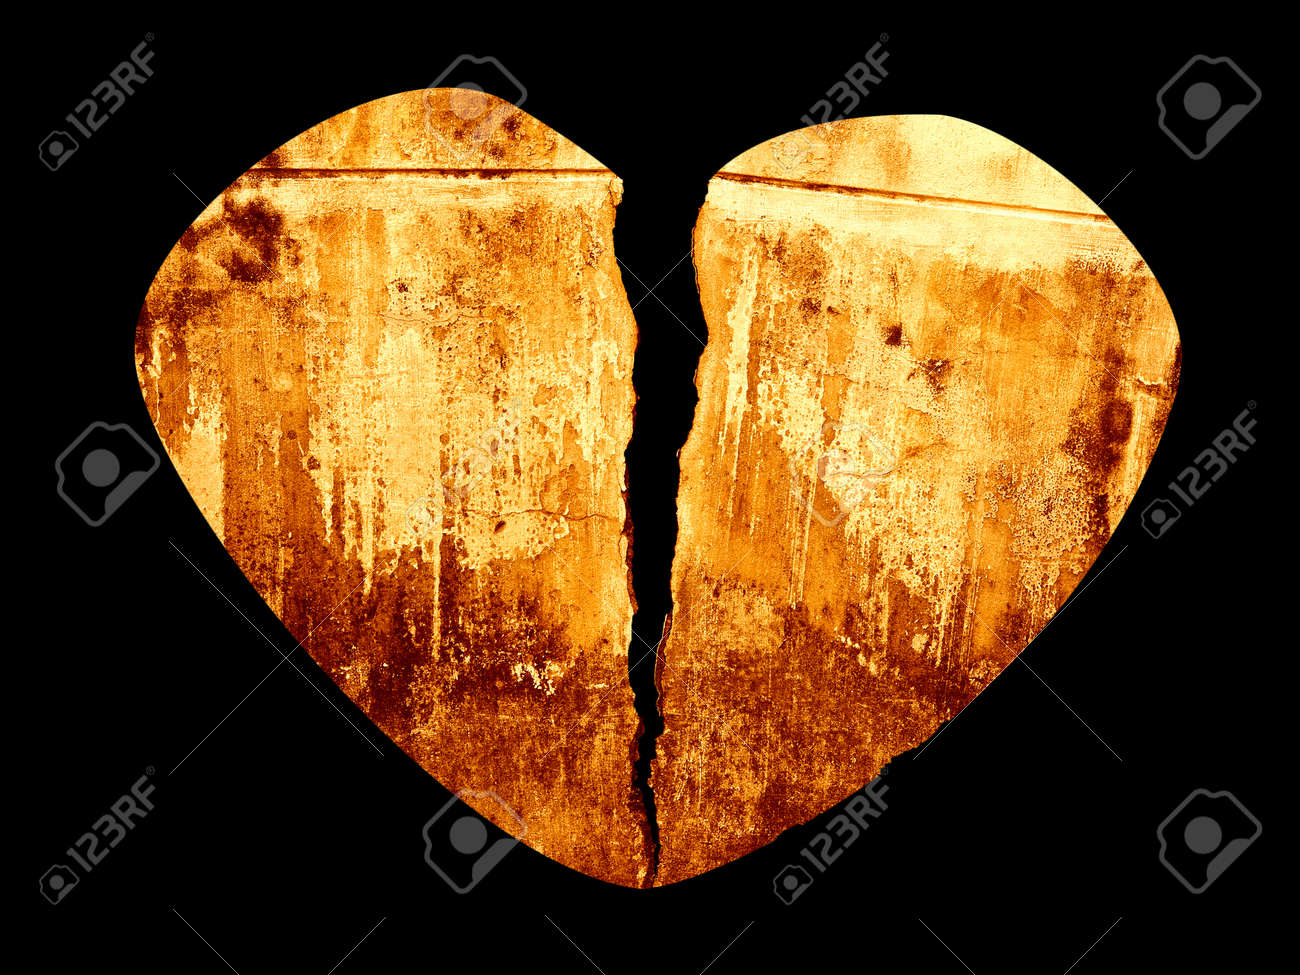 Broken Heart Grunge Crack Style Illustration Isolated on Black Stock Illustration - 17379425